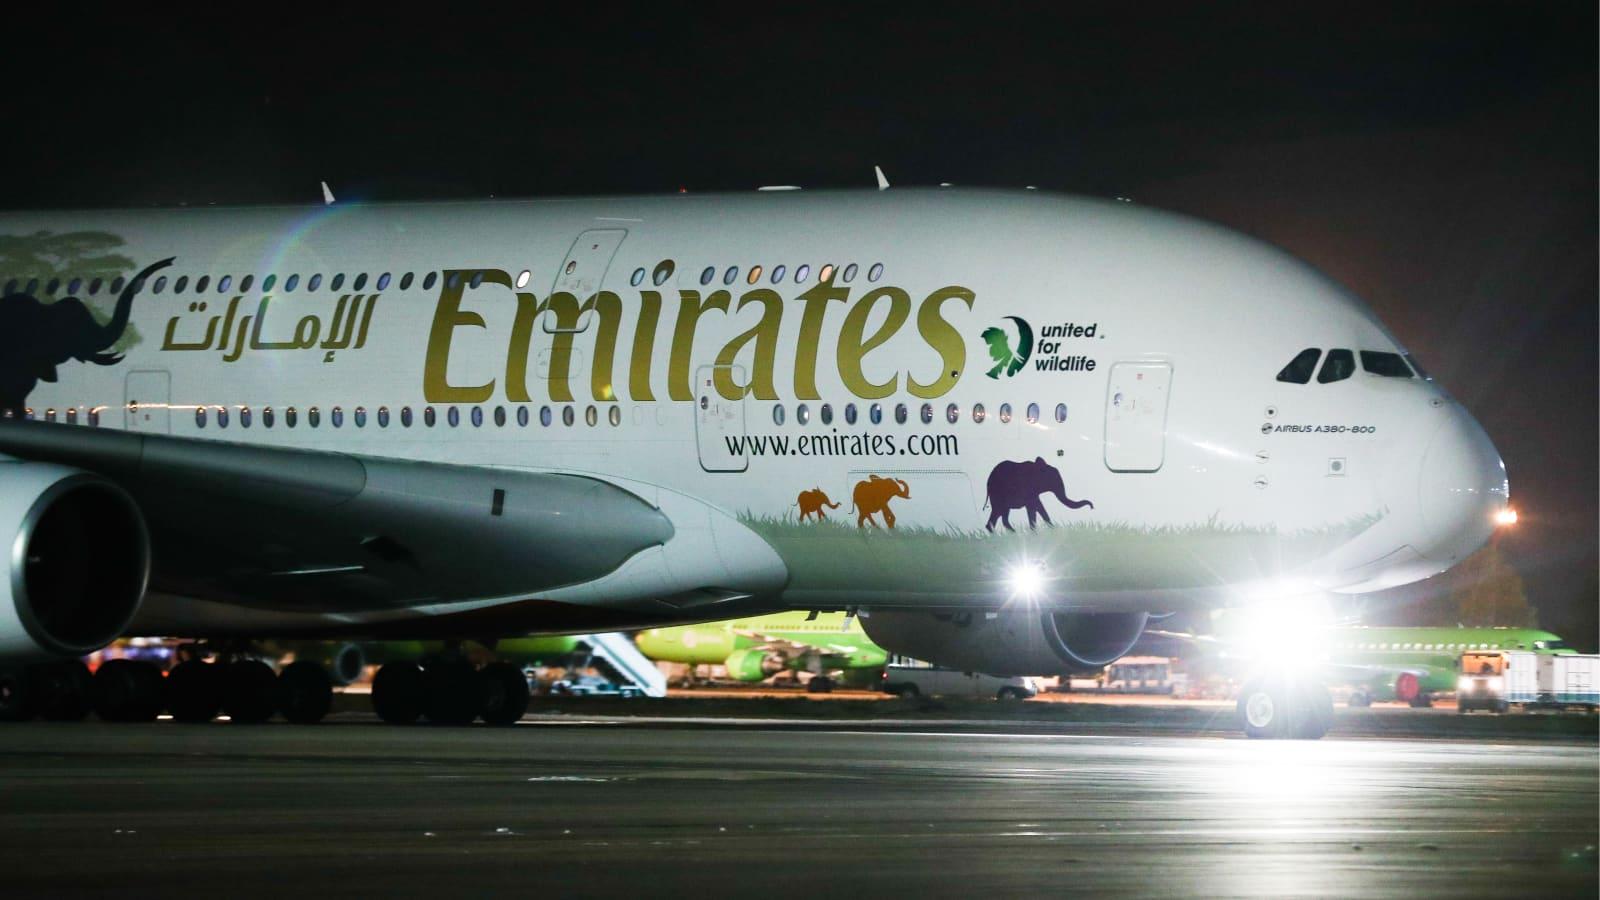 Самолет эмирейтс москва дубай видео отель бурдж аль араб дубай